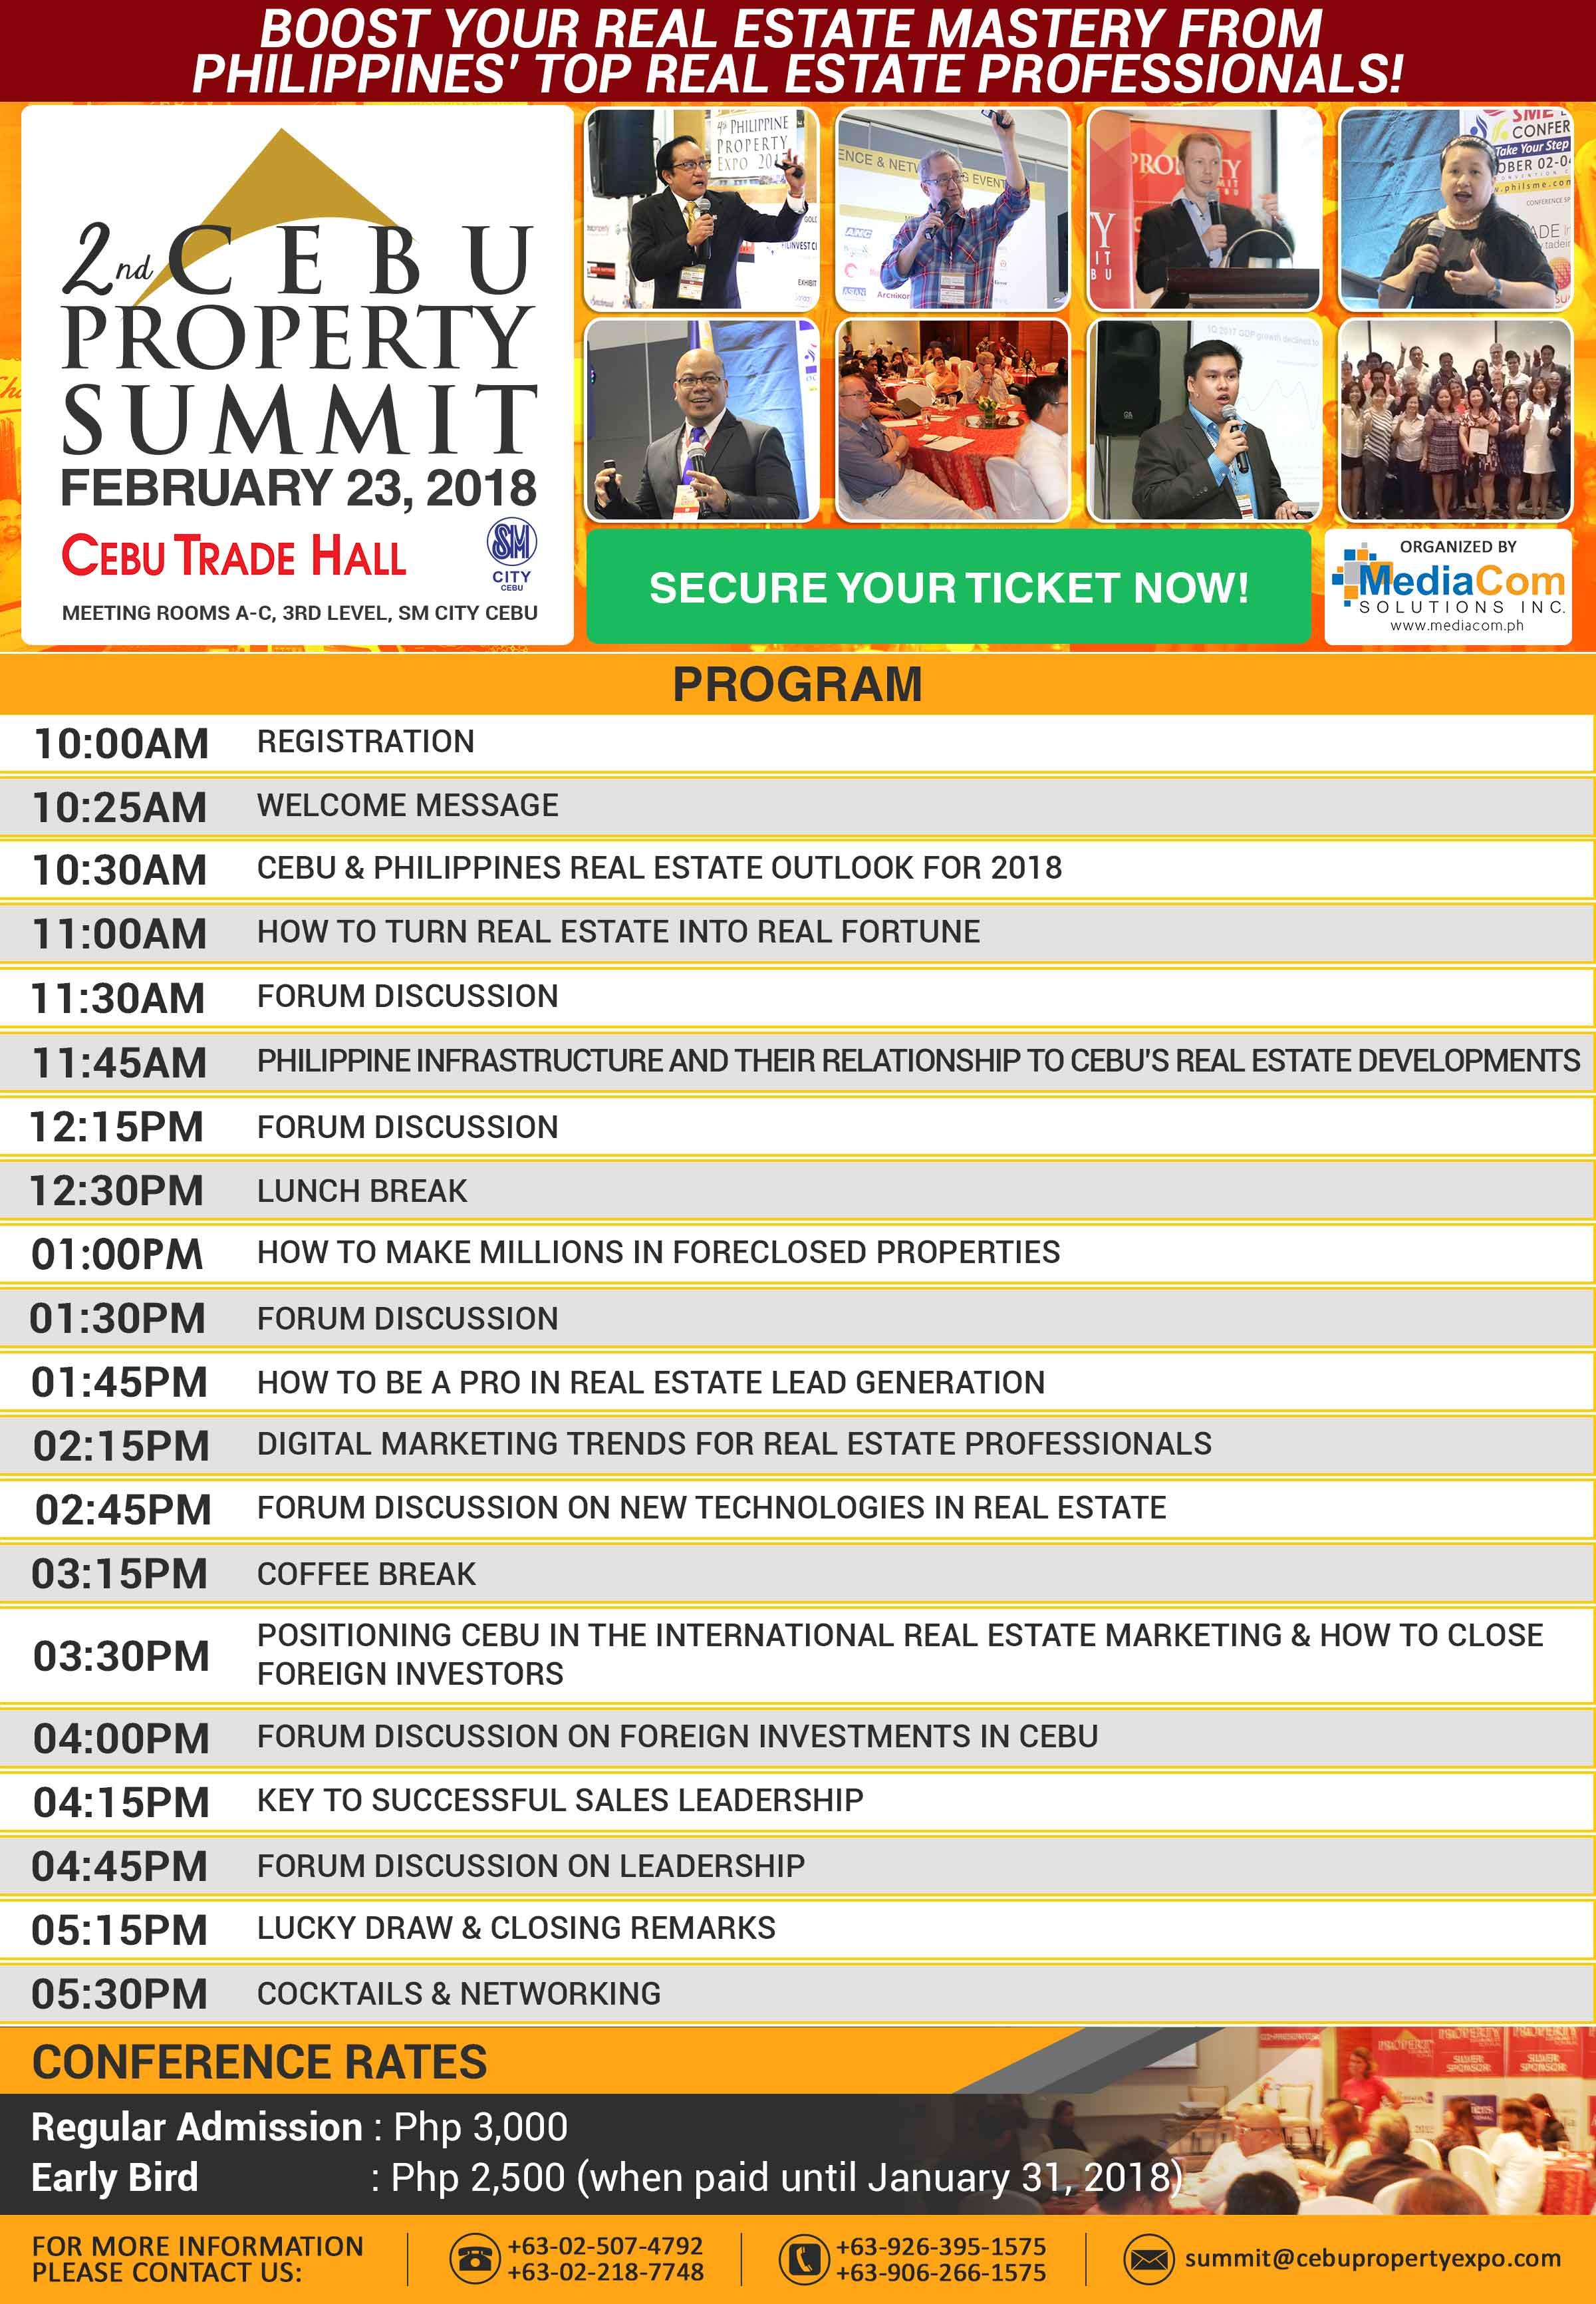 2nd Cebu Property Summit 2018 Program Poster